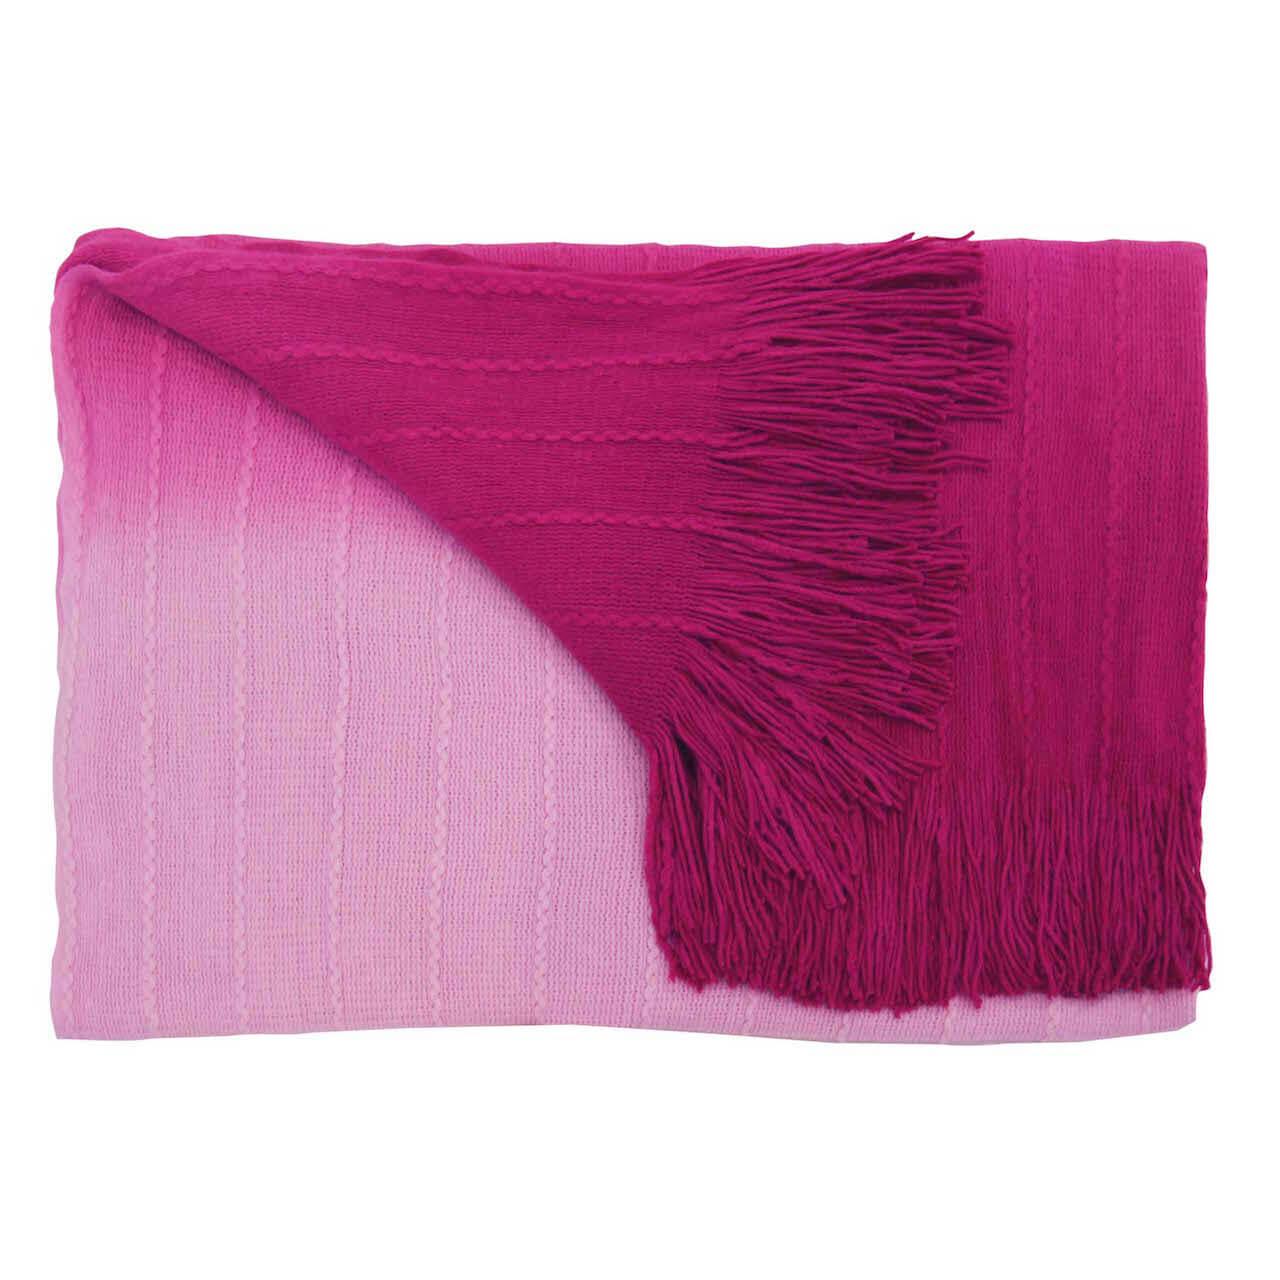 Decke Farbe Fuchsia: Strickdecke Farbverlauf (Fuchsia)